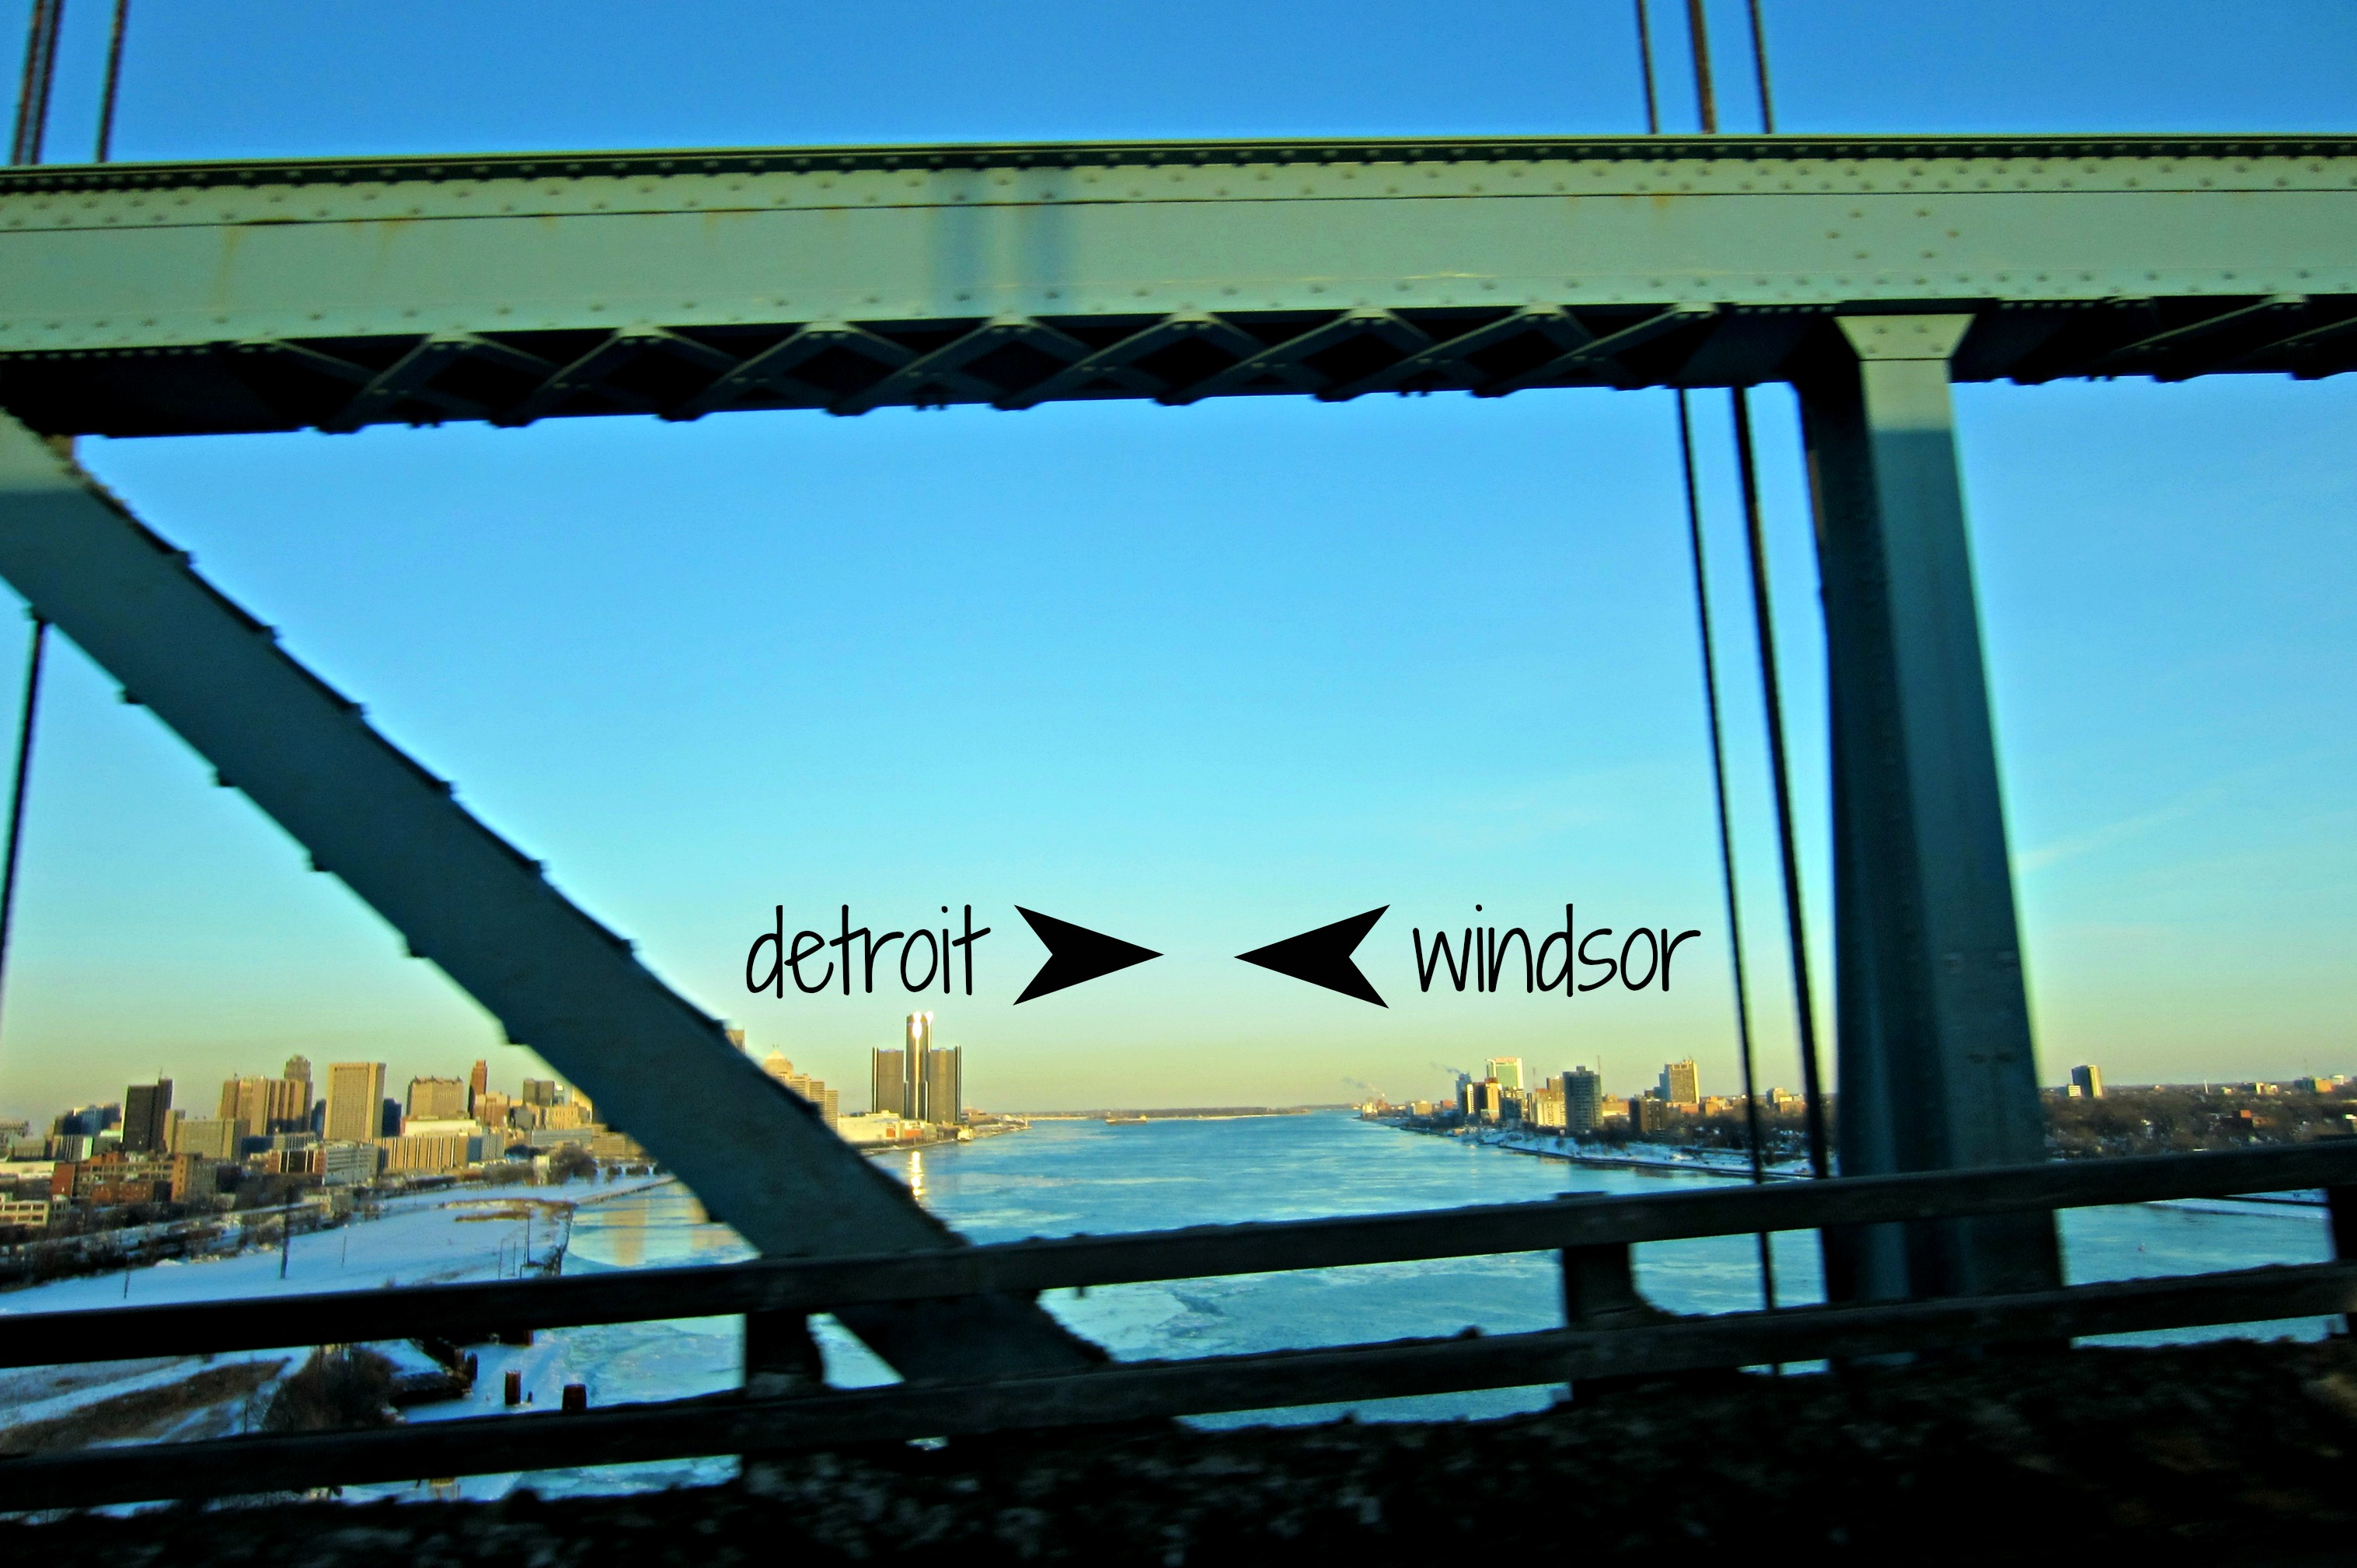 detroit to windsor on ambassador bridge